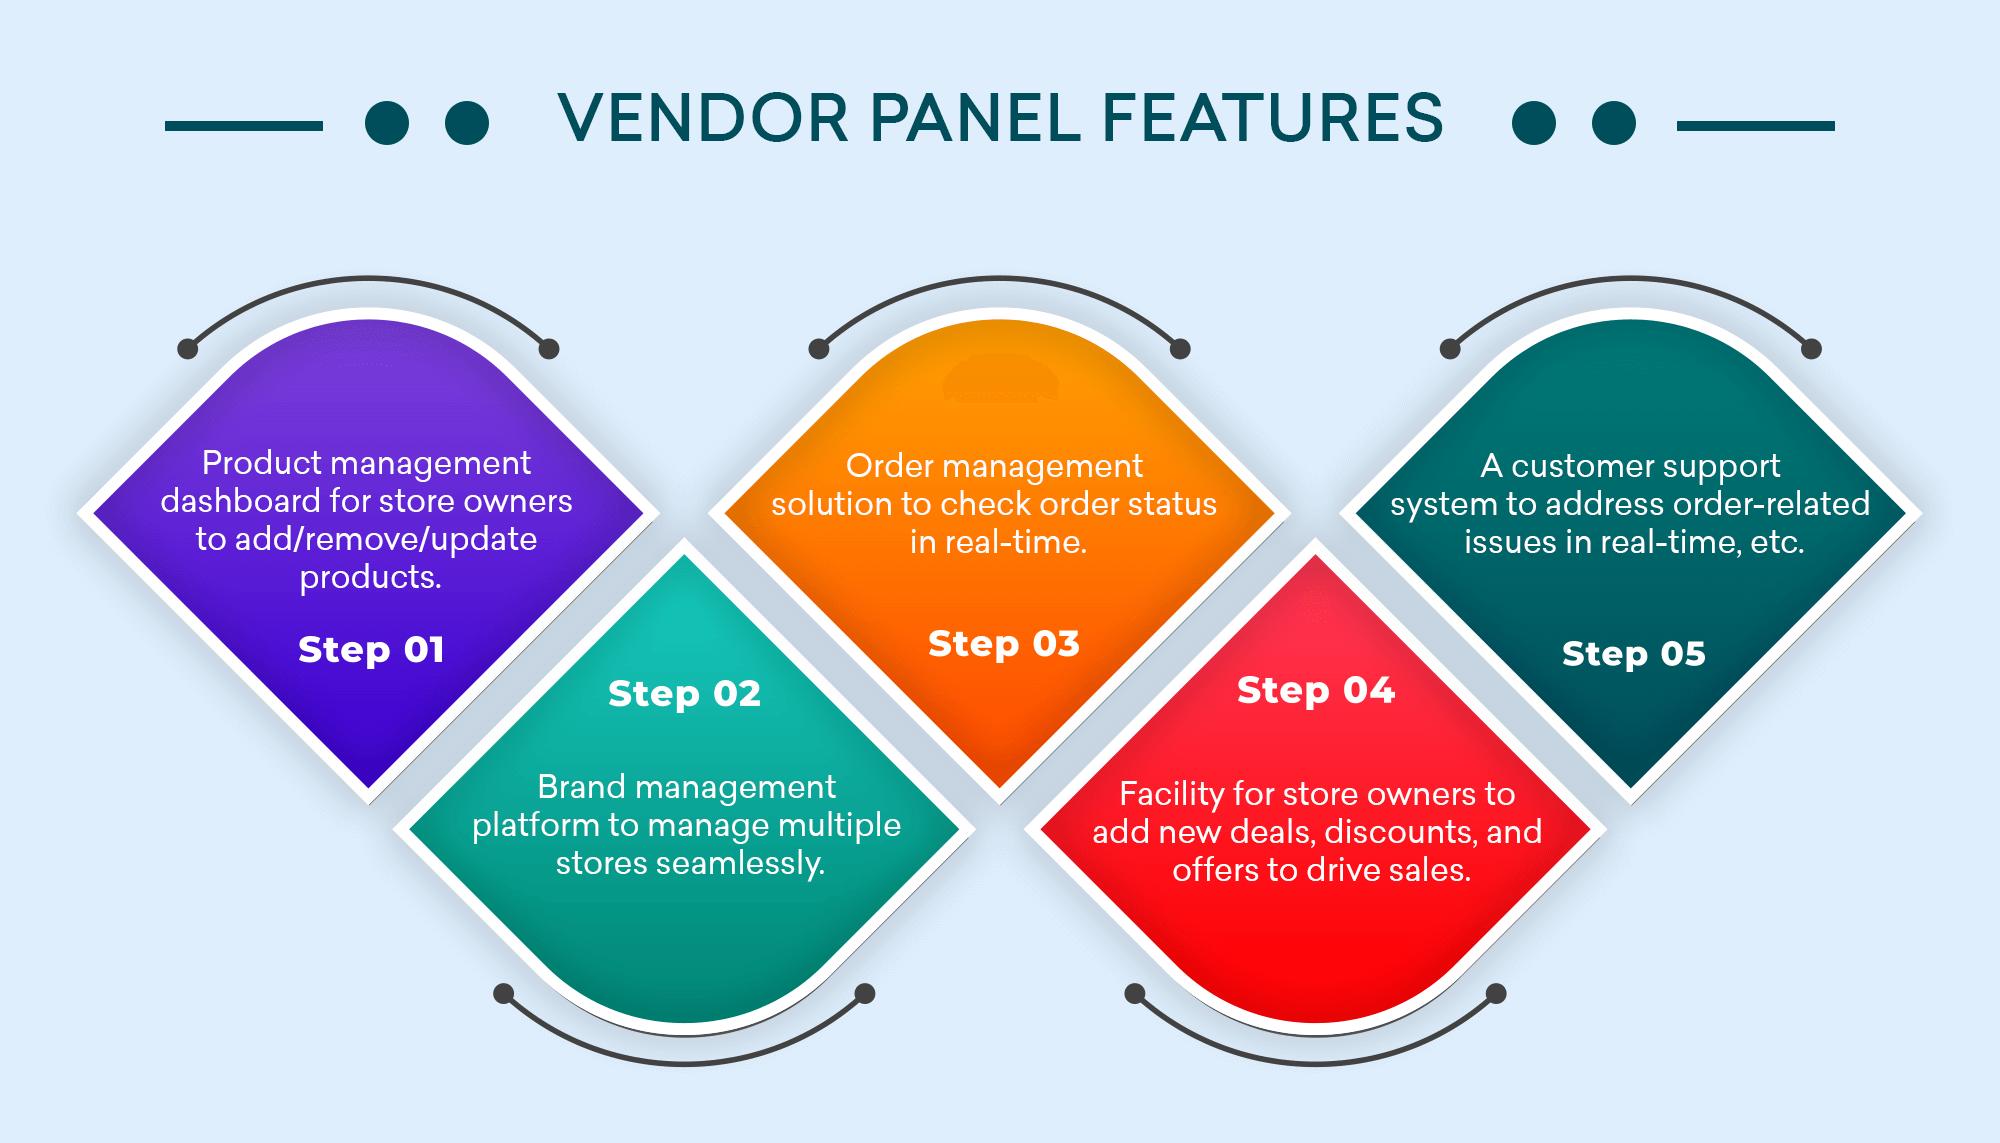 Vendor panel features